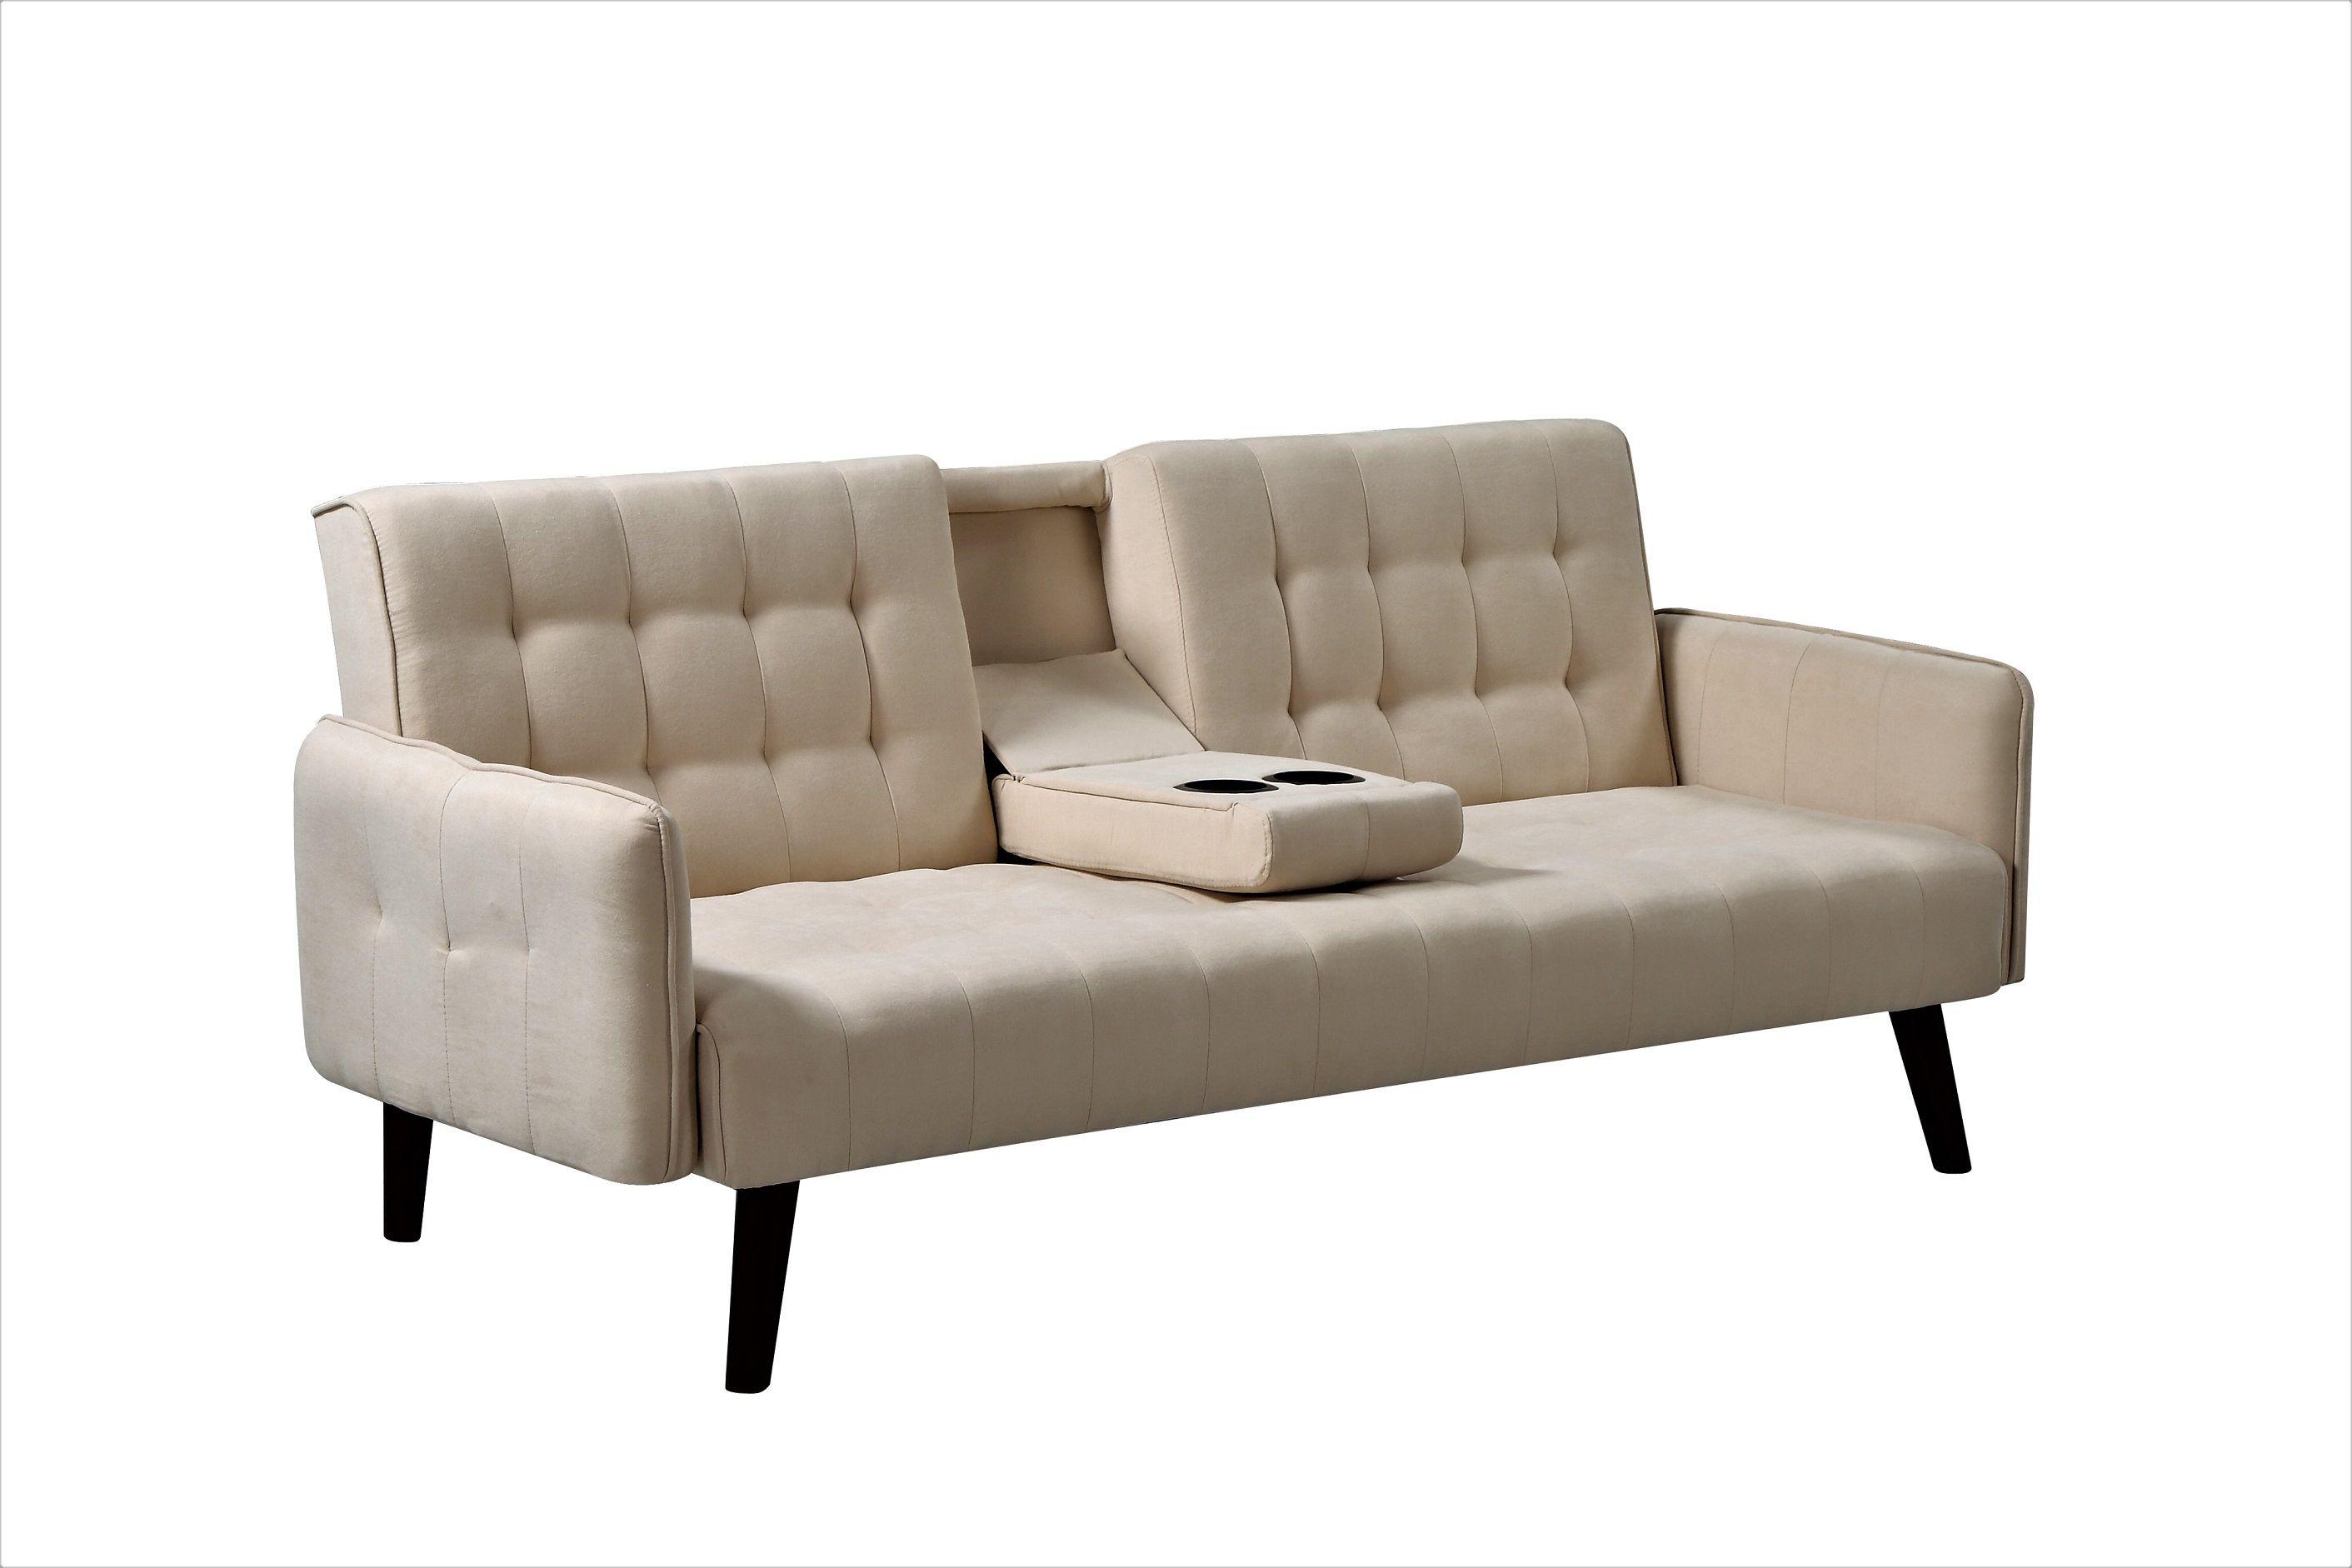 Us Pride Furniture Hash Sofa Bed Beige Walmart Com Sofa Bed Beige Sofa Sofa Bed Sleeper